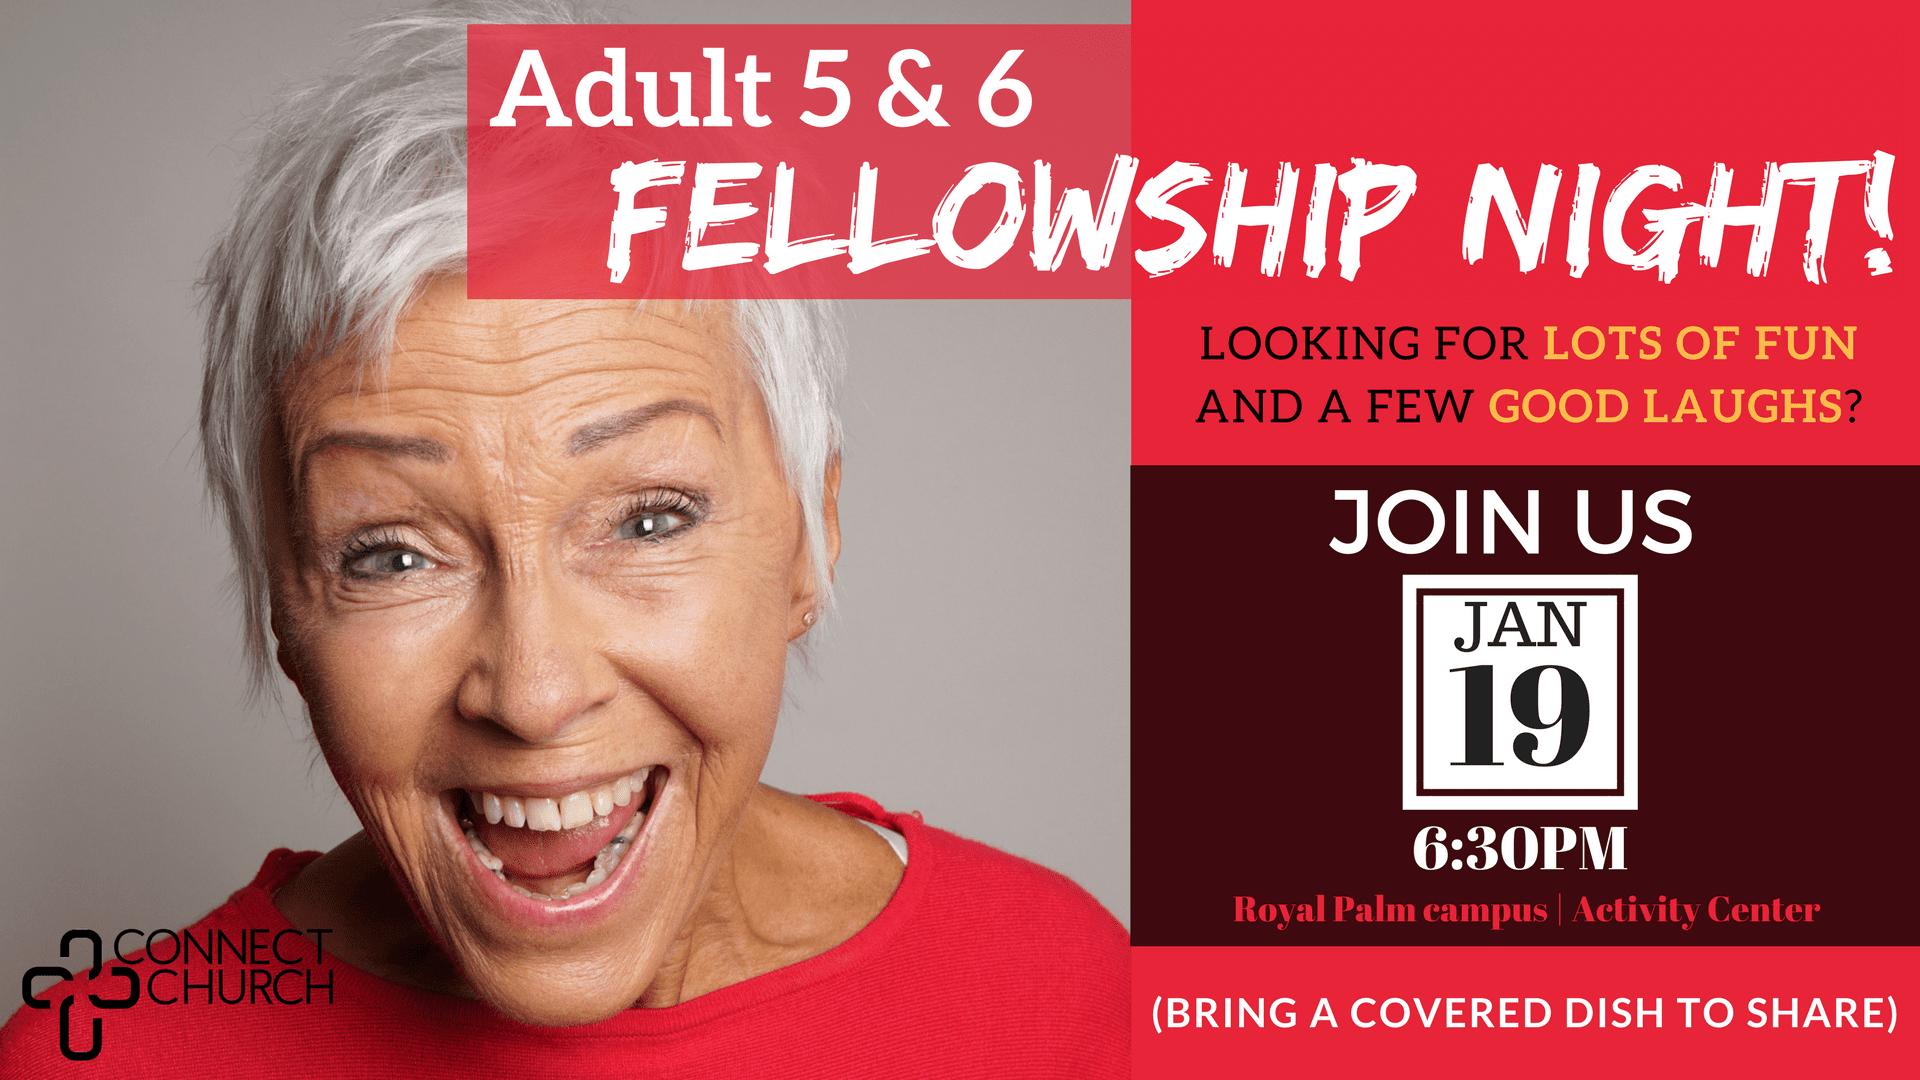 Copy of Adult 5 & 6 Fellowship Night